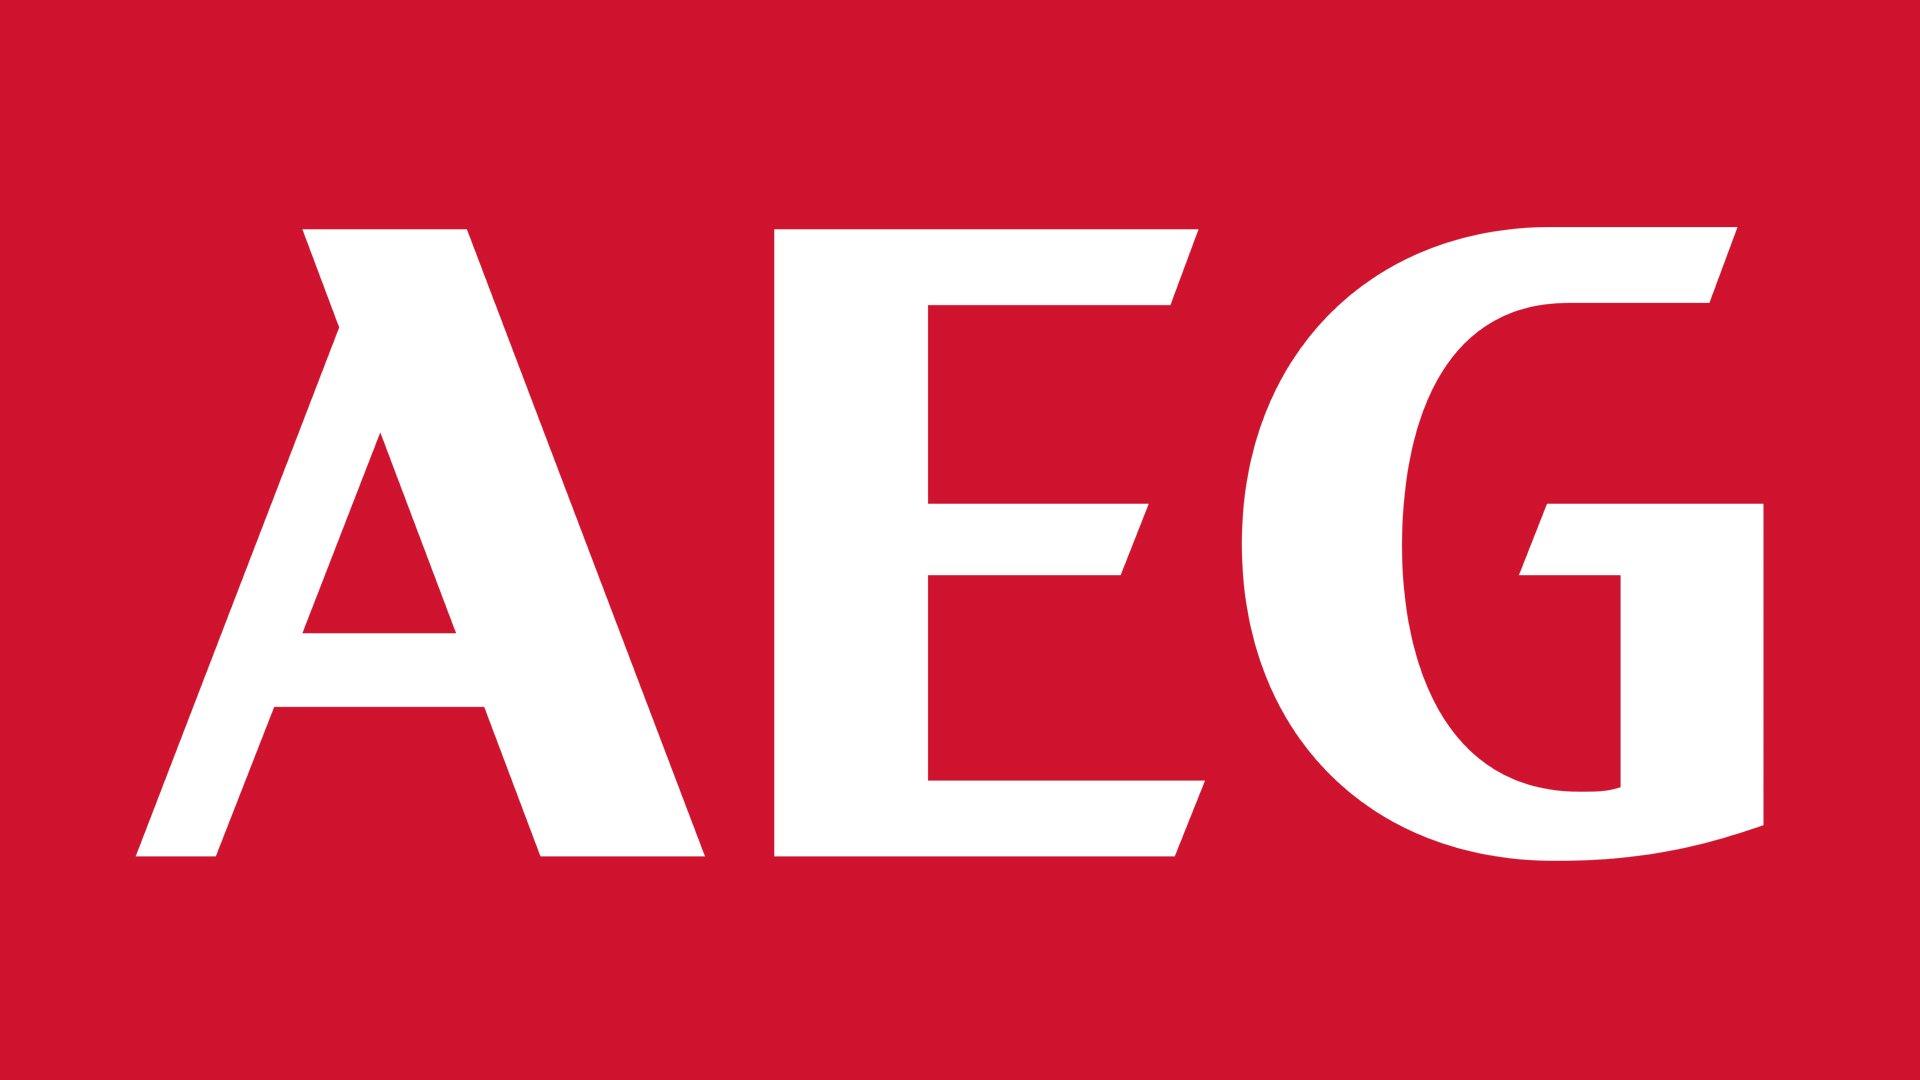 aeg logo aeg symbol meaning history and evolution